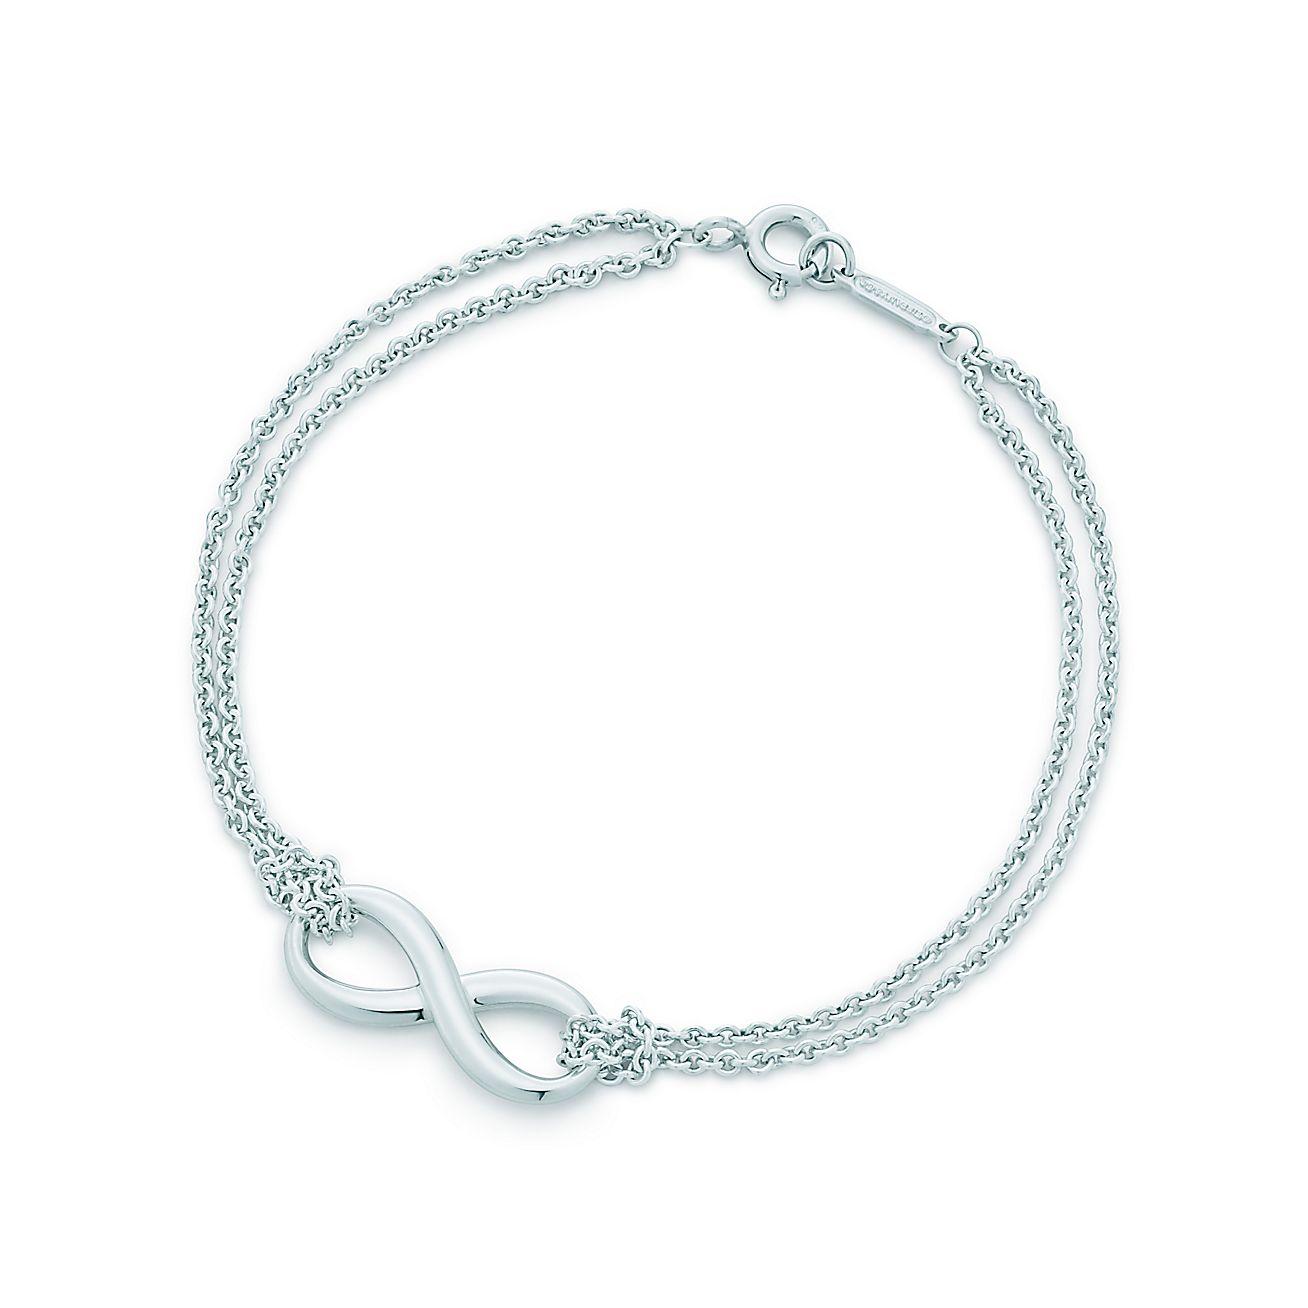 tiffany infinity armband aus sterlingsilber medium. Black Bedroom Furniture Sets. Home Design Ideas